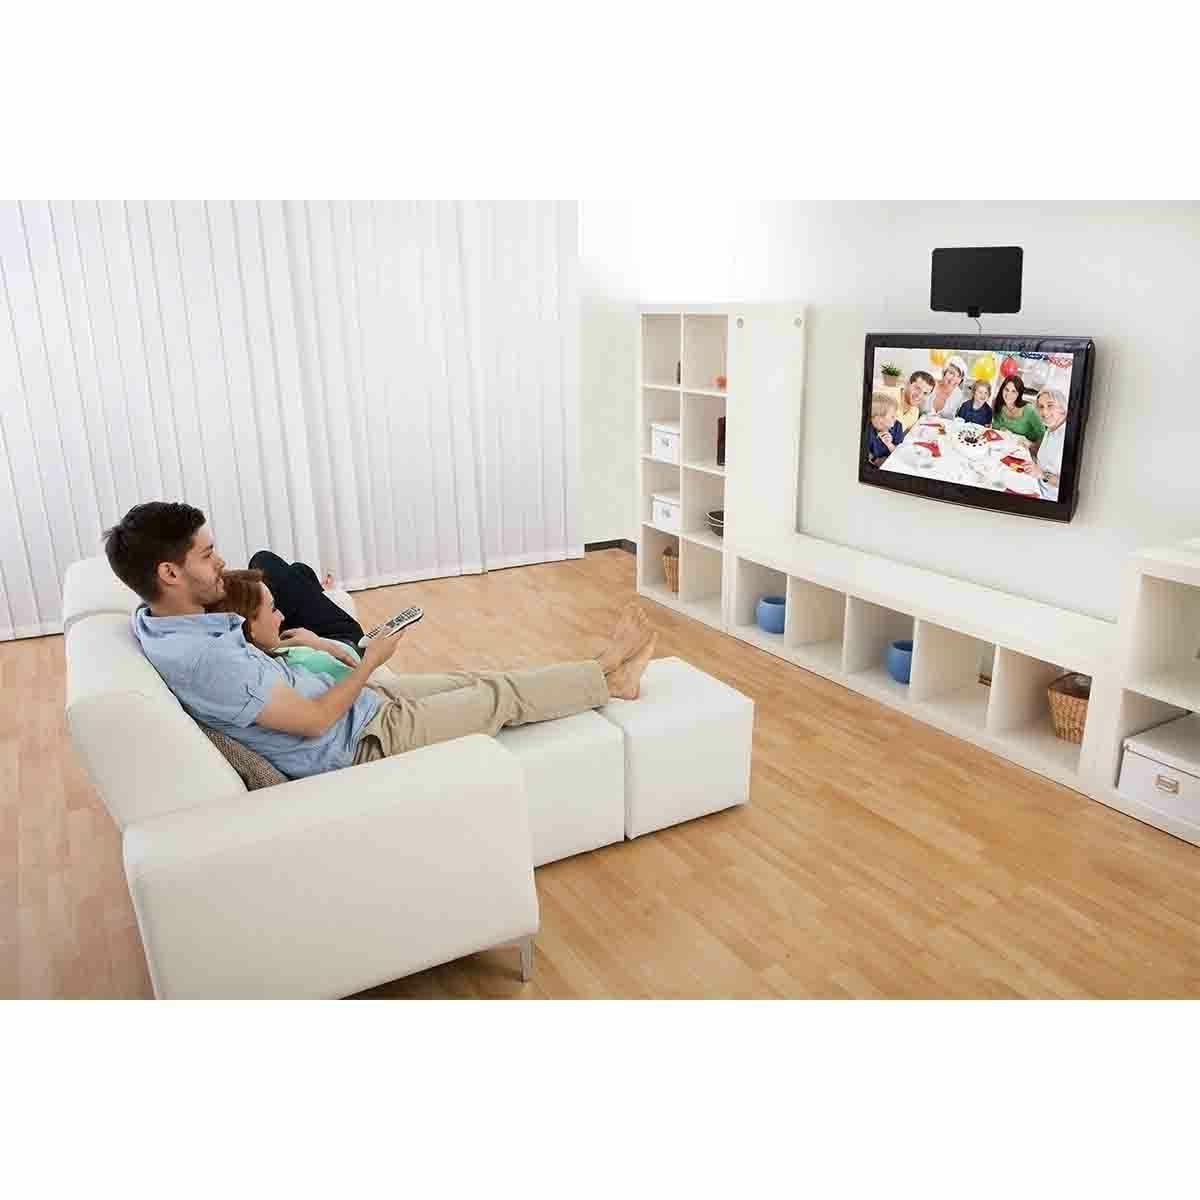 Thin Indoor TV Black Fosmon